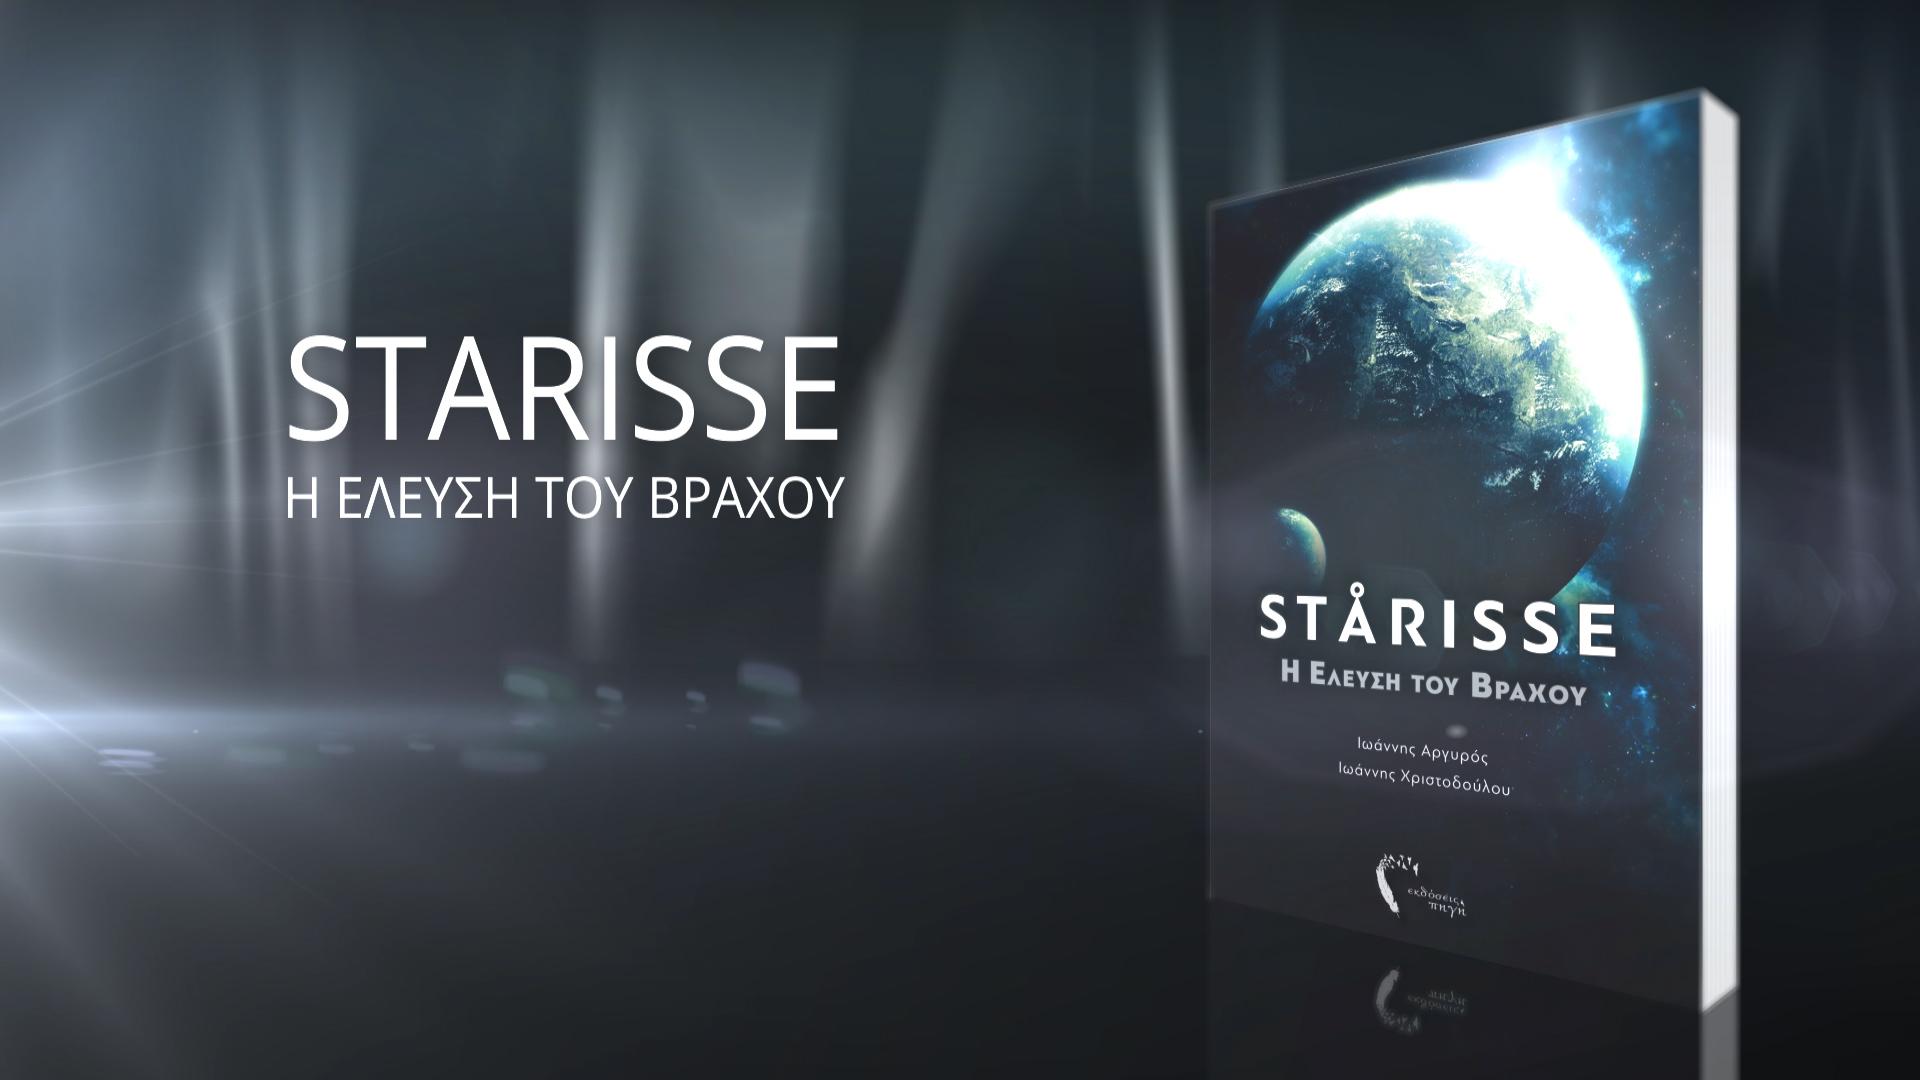 STARISSE - Η Έλευση του Βράχου